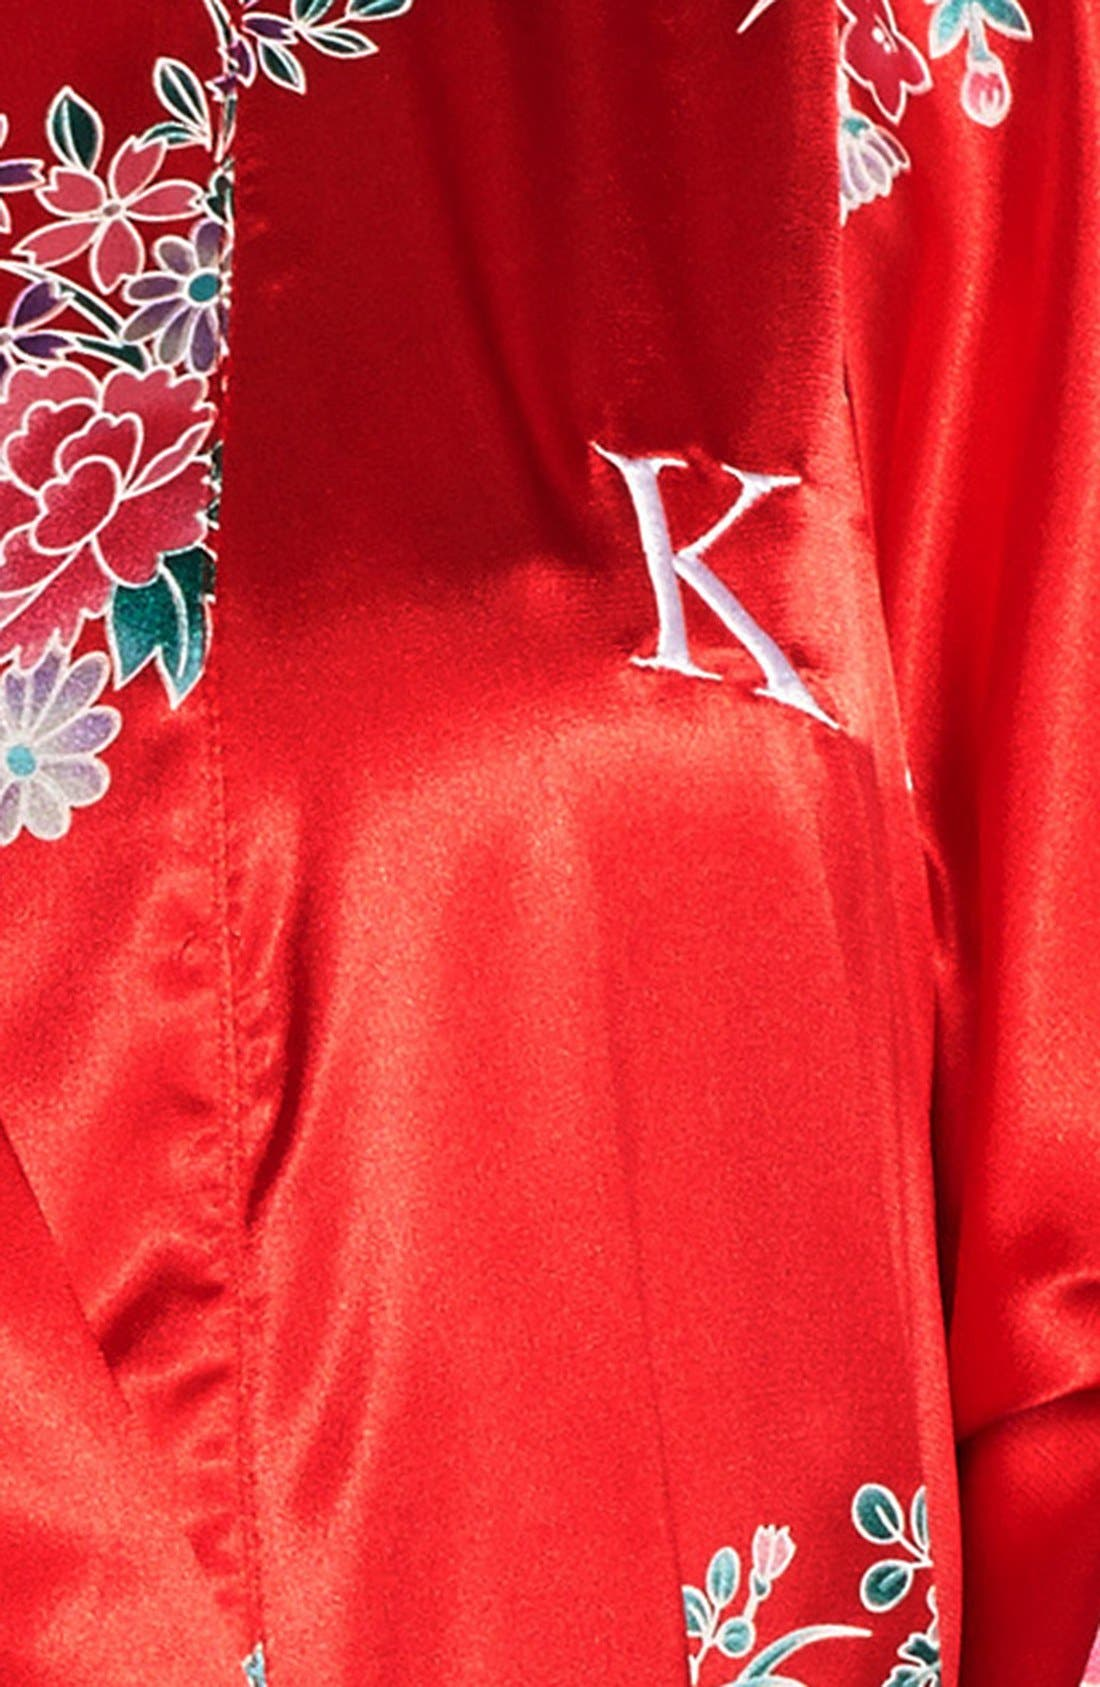 Monogram Floral Satin Robe,                             Alternate thumbnail 141, color,